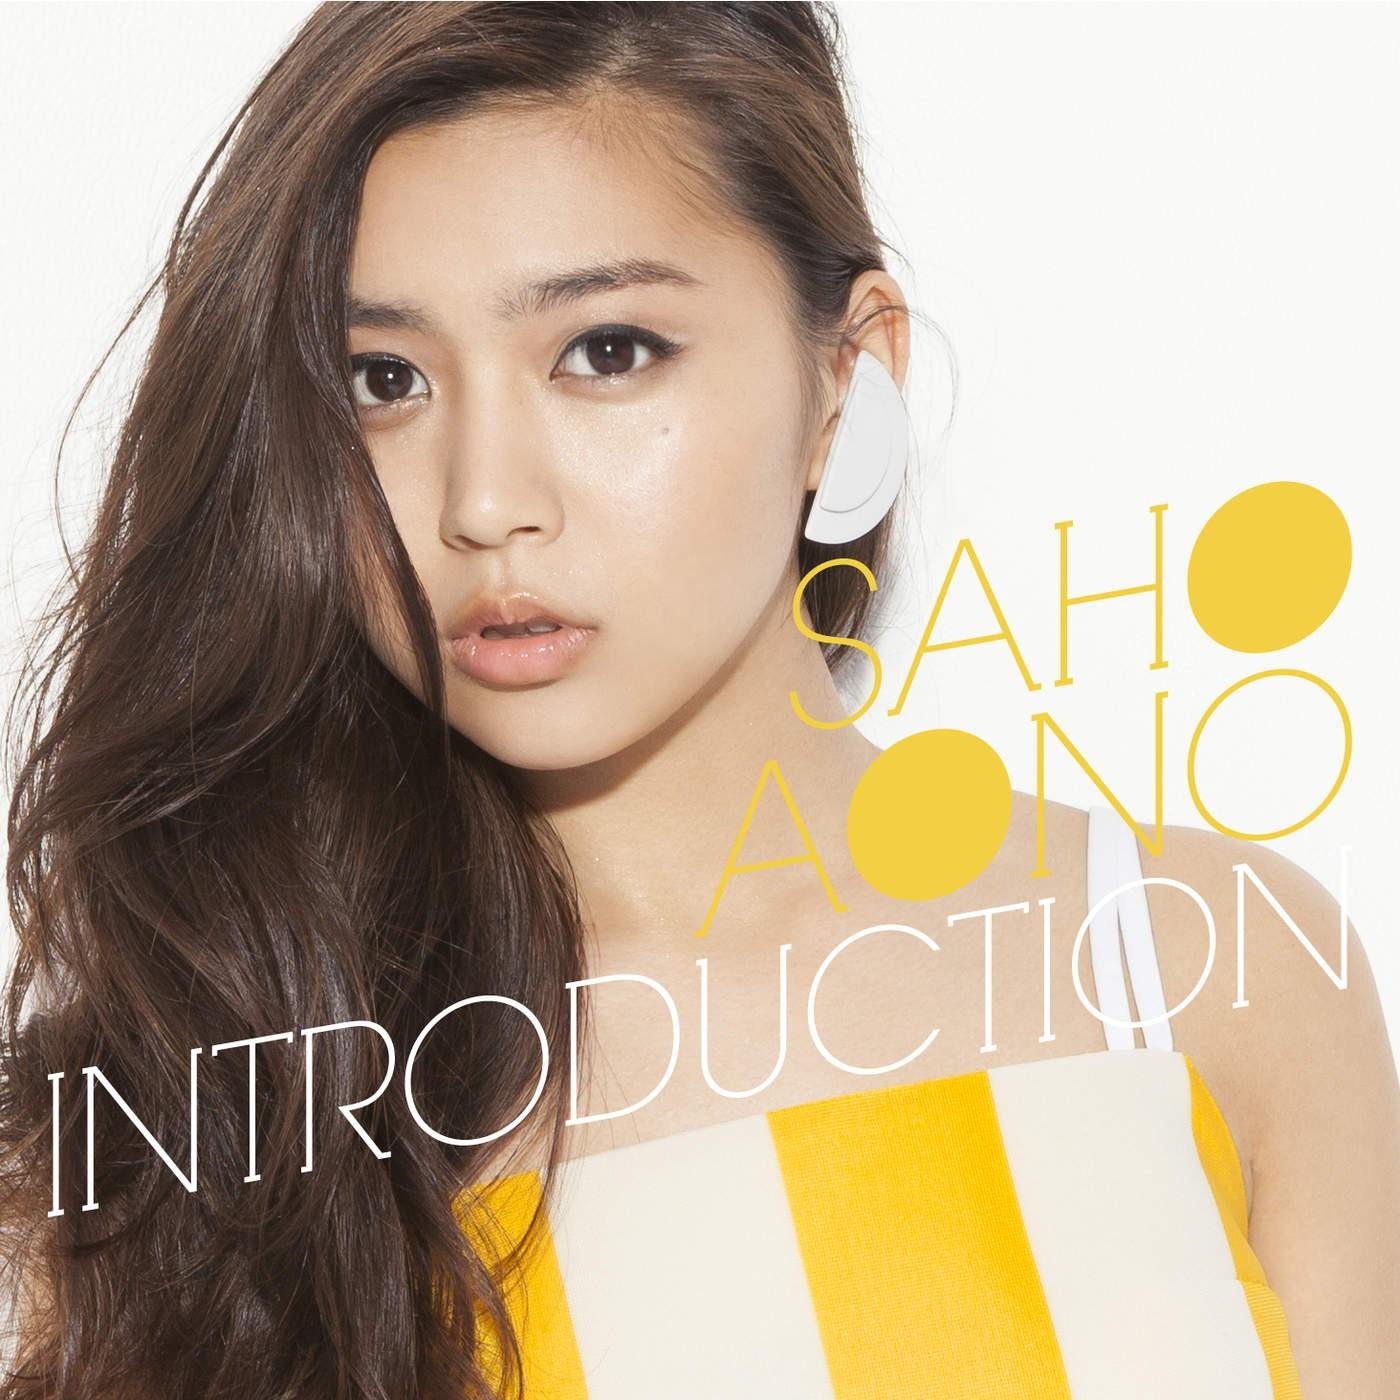 20161117.03.93 Saho Aono - Introduction (M4A) cover.jpg